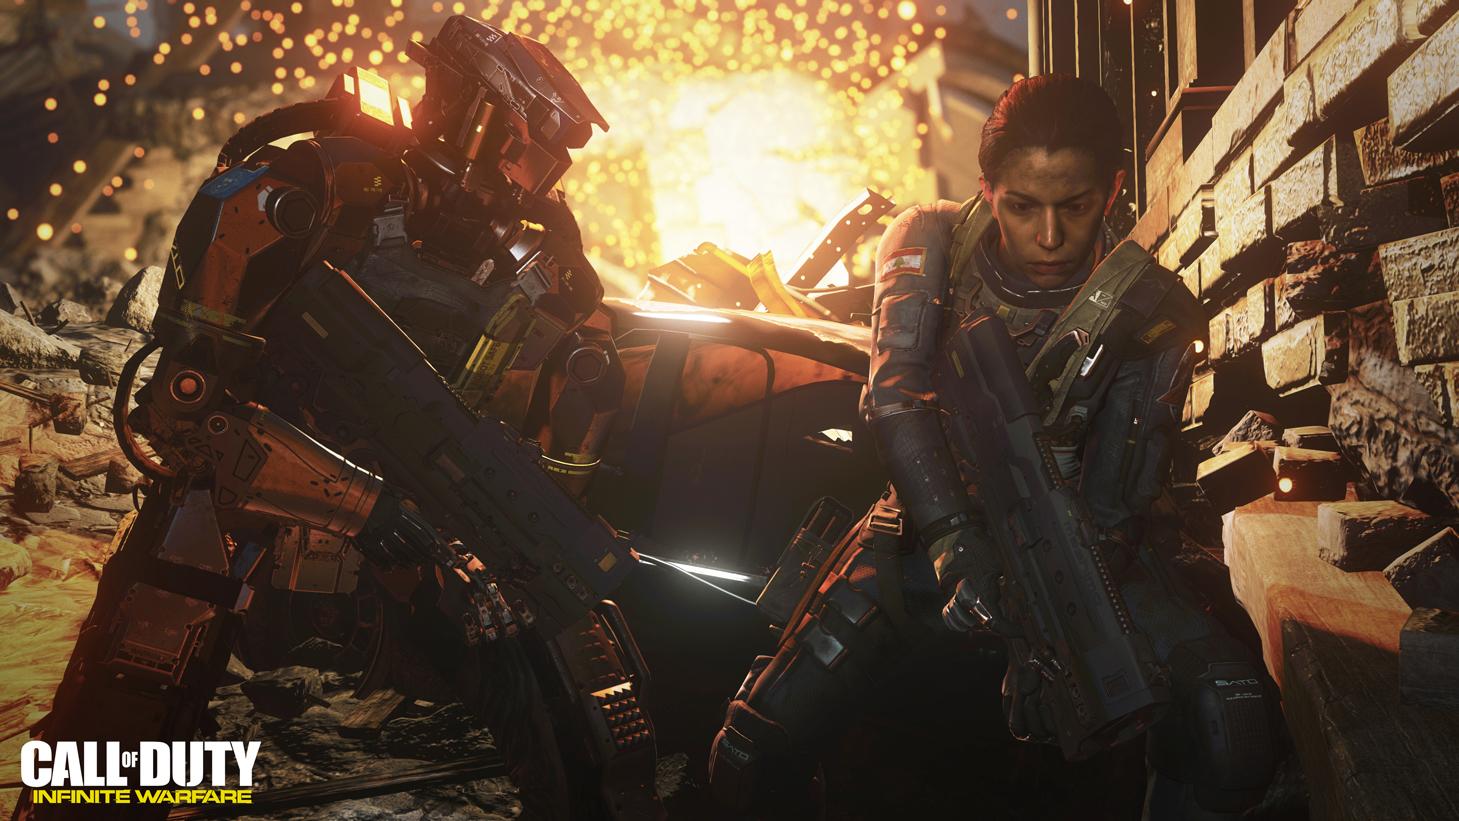 Kit Harington to play a villain in Call of Duty 11:13AM